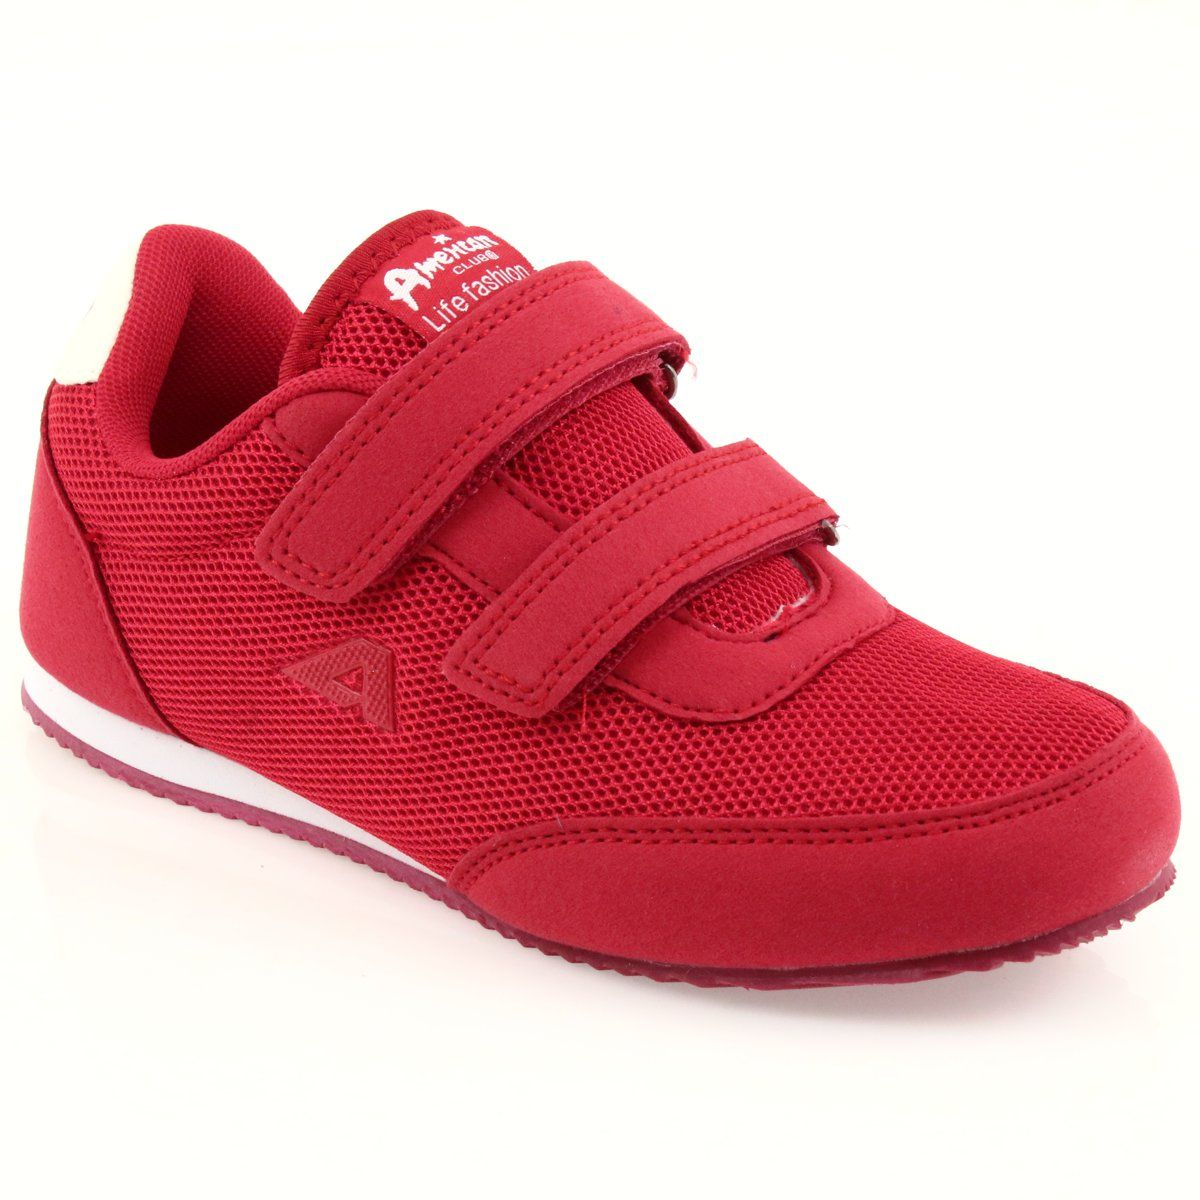 Buty Sportowe Adidasy Czerwone American Club Biale Shoes Sneakers Fashion